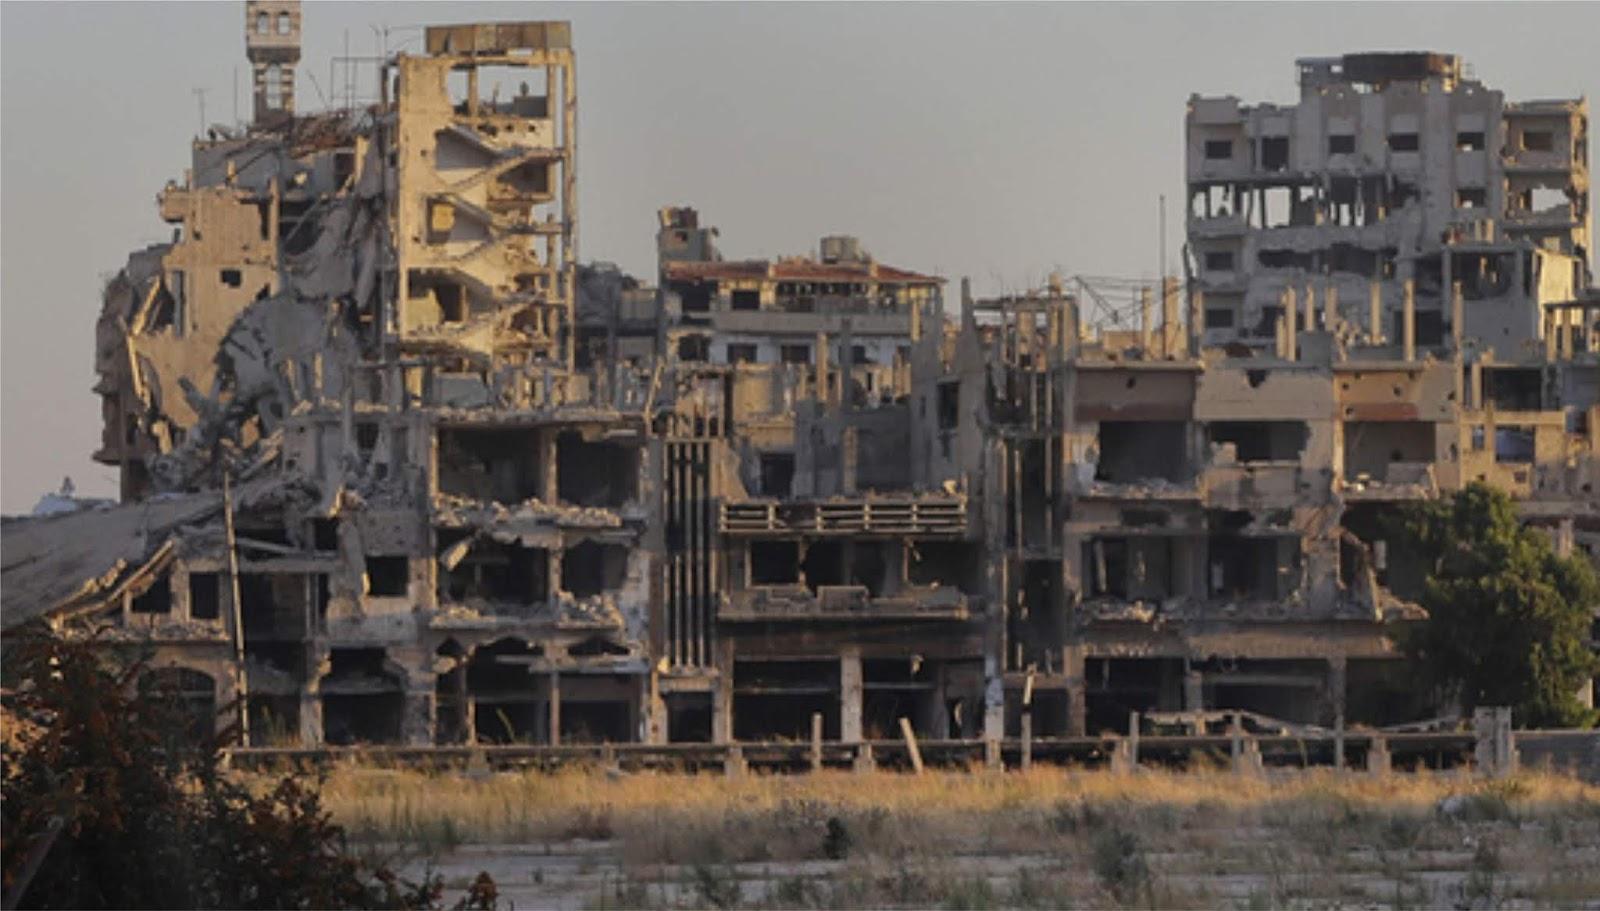 Putin telah menyatakan Rusia siap membantu mebersihkan teroris di Idlib